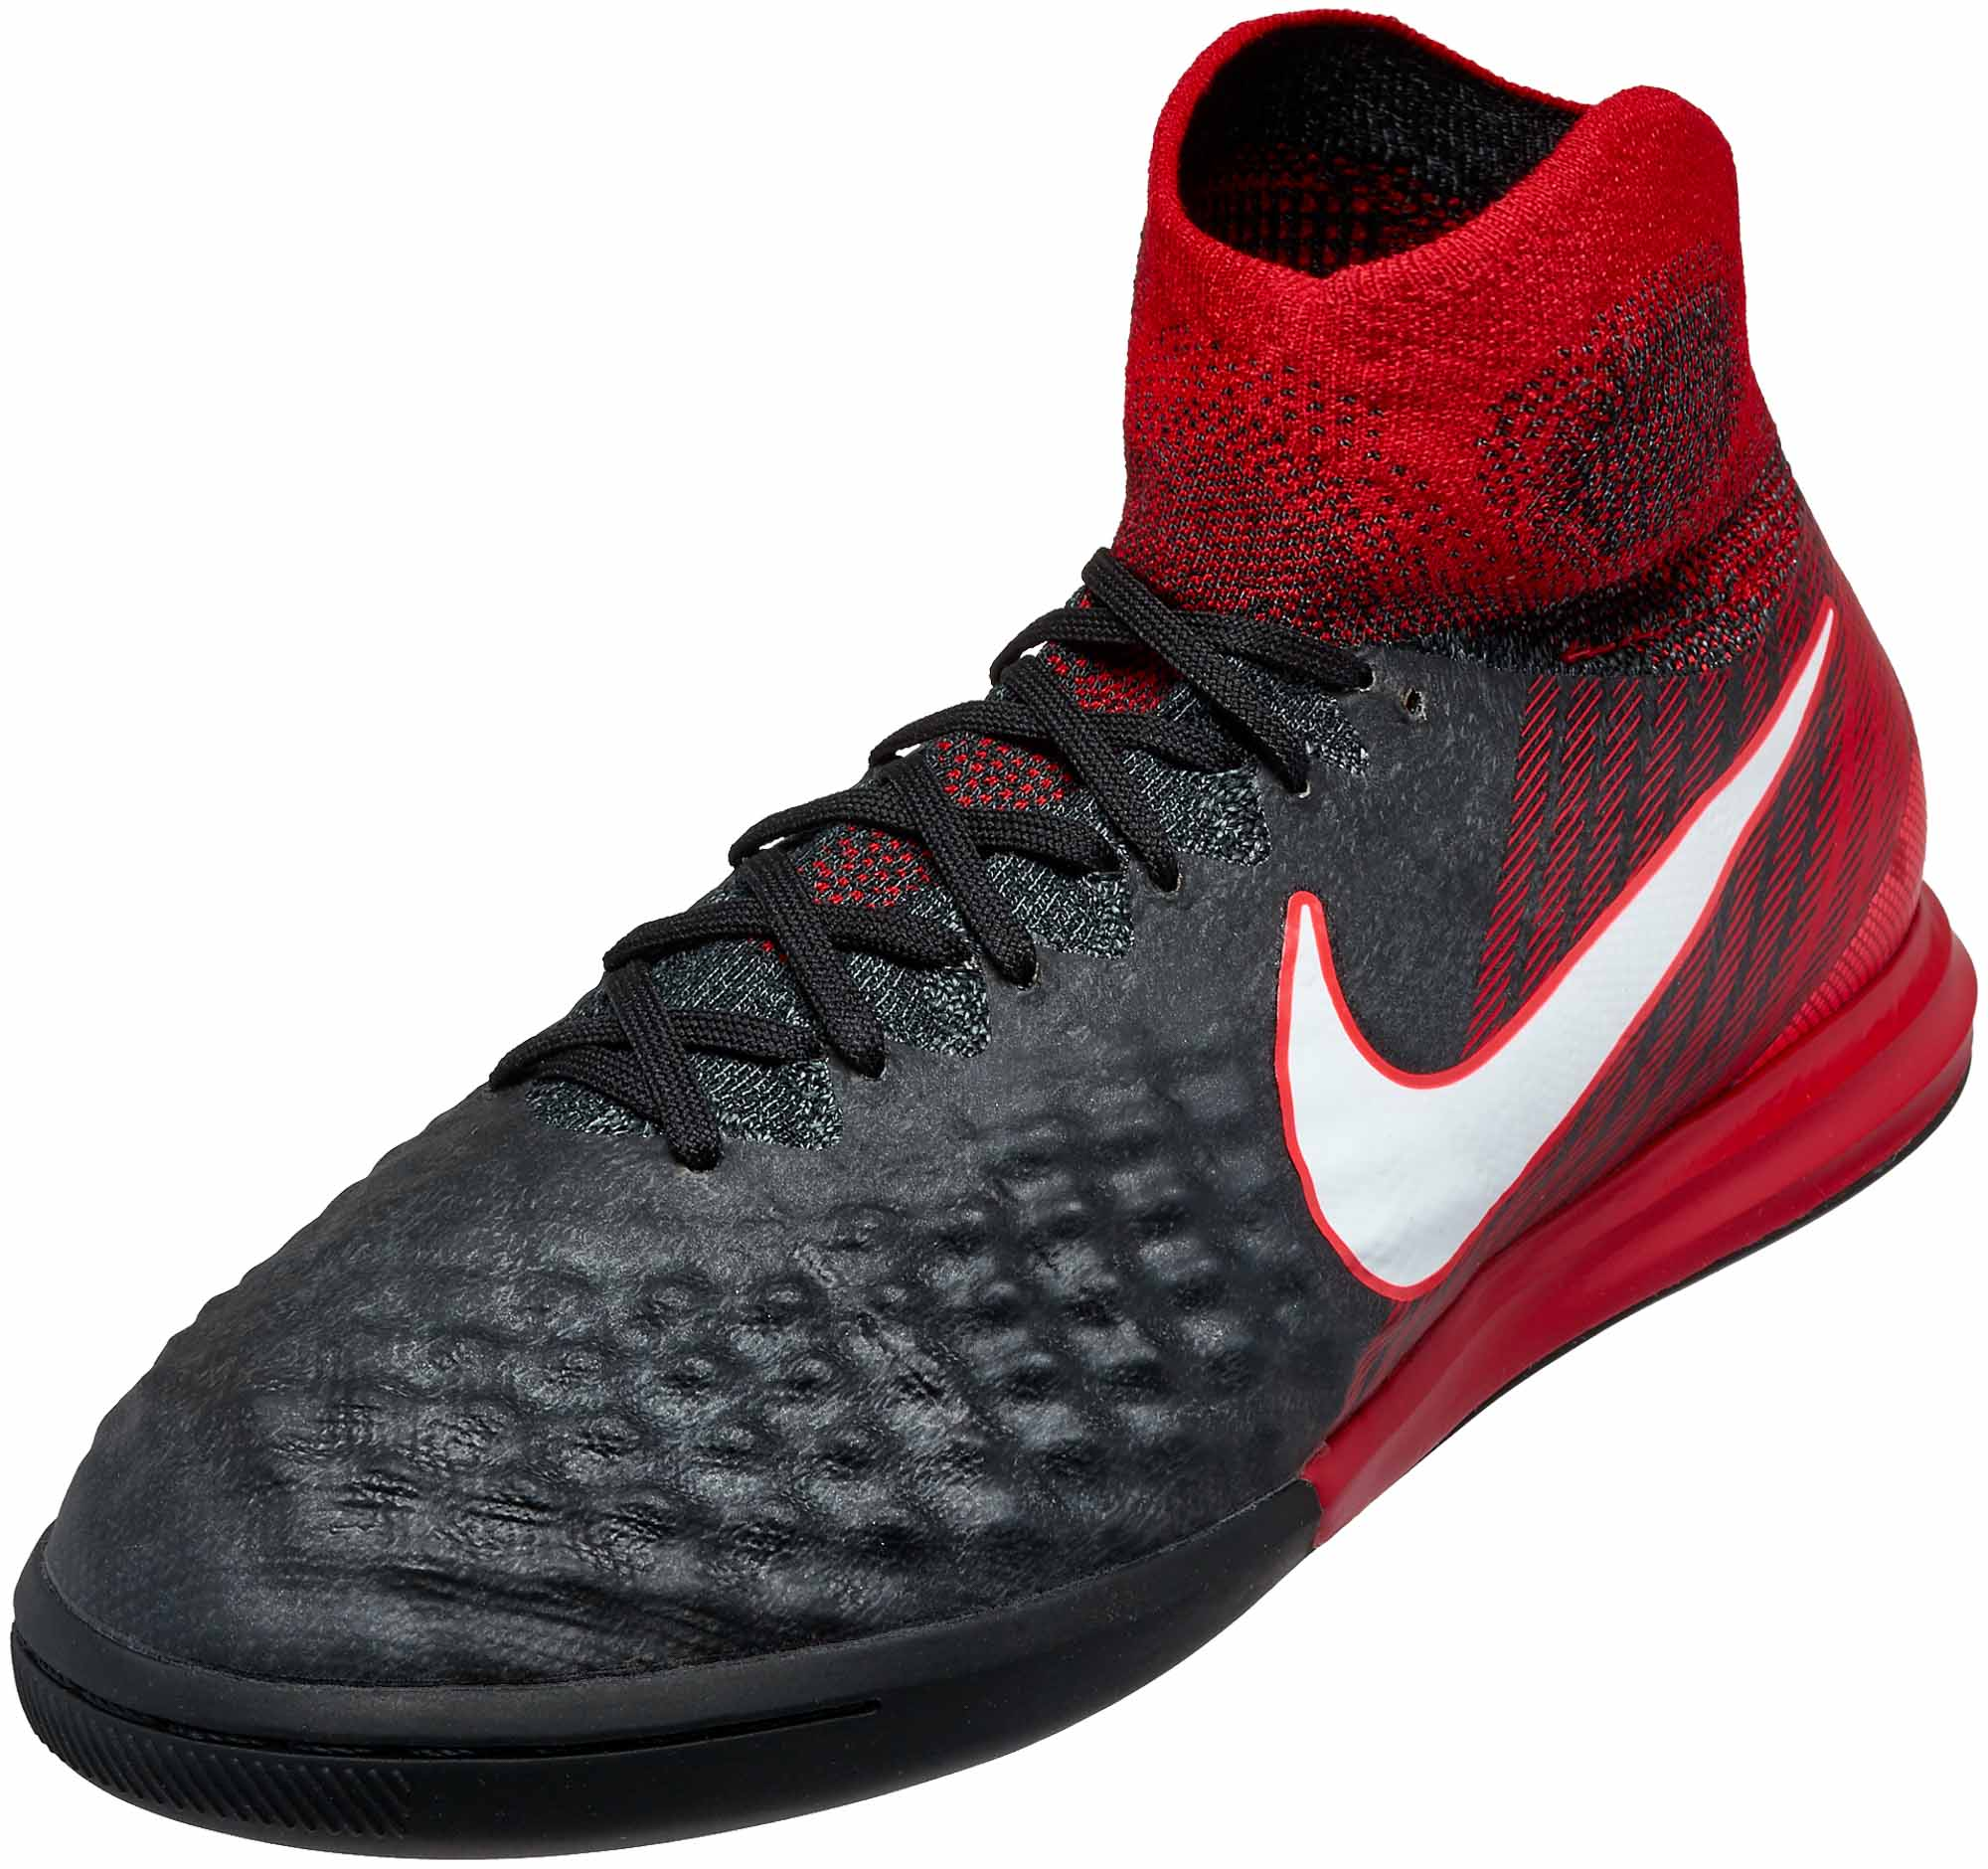 77f083785 Nike MagistaX Proximo II IC - Black   White - Soccer Master